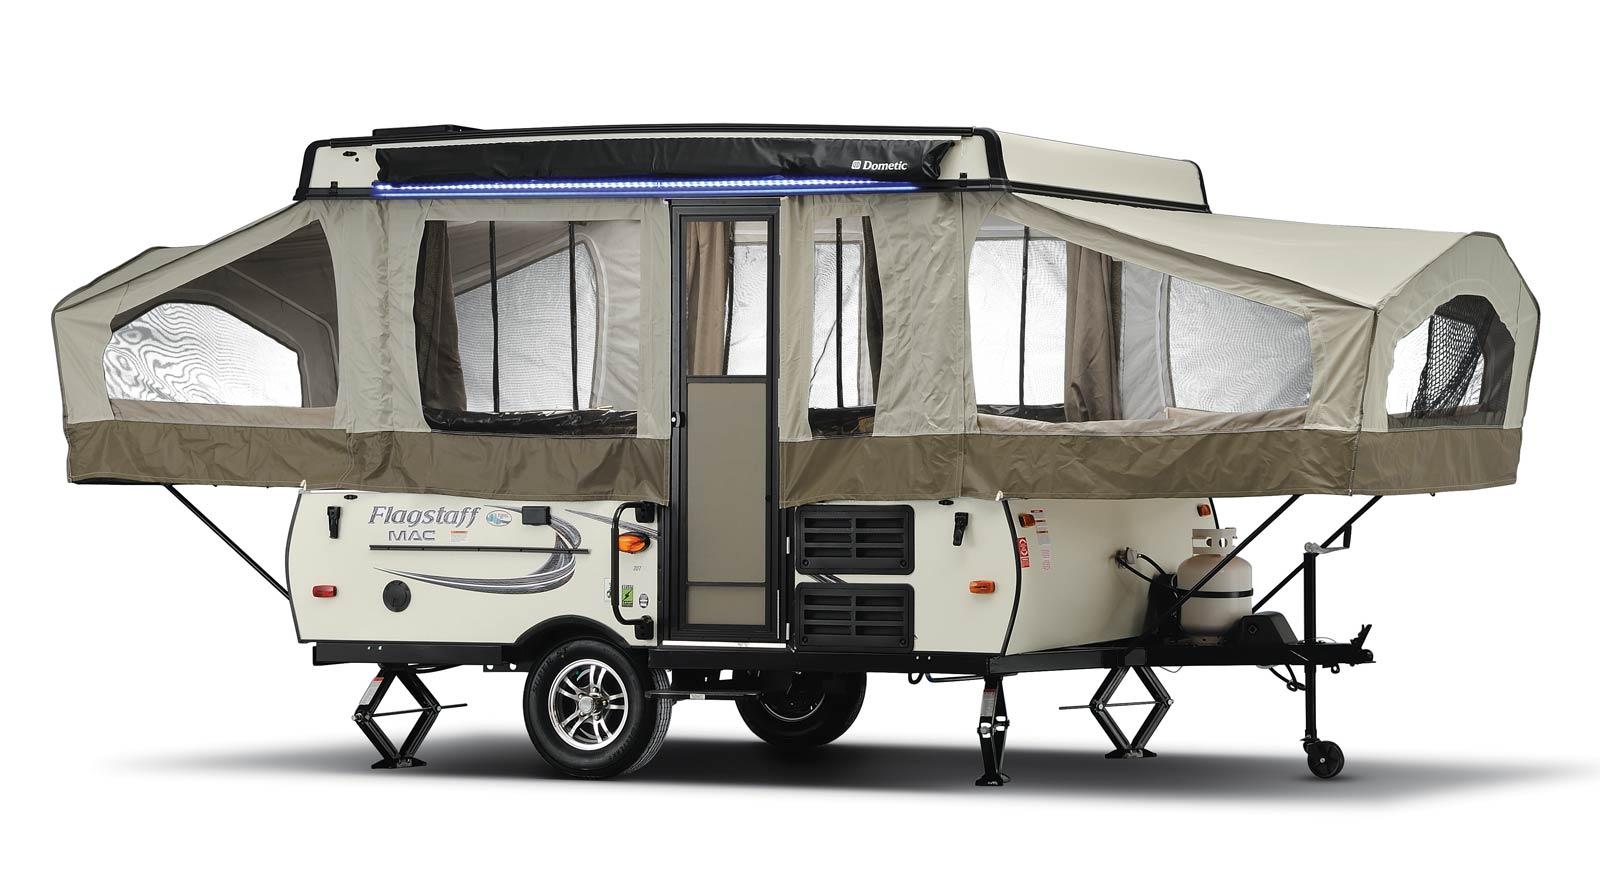 Flagstaff 207 Camping Trailer Roberts Sales Denver